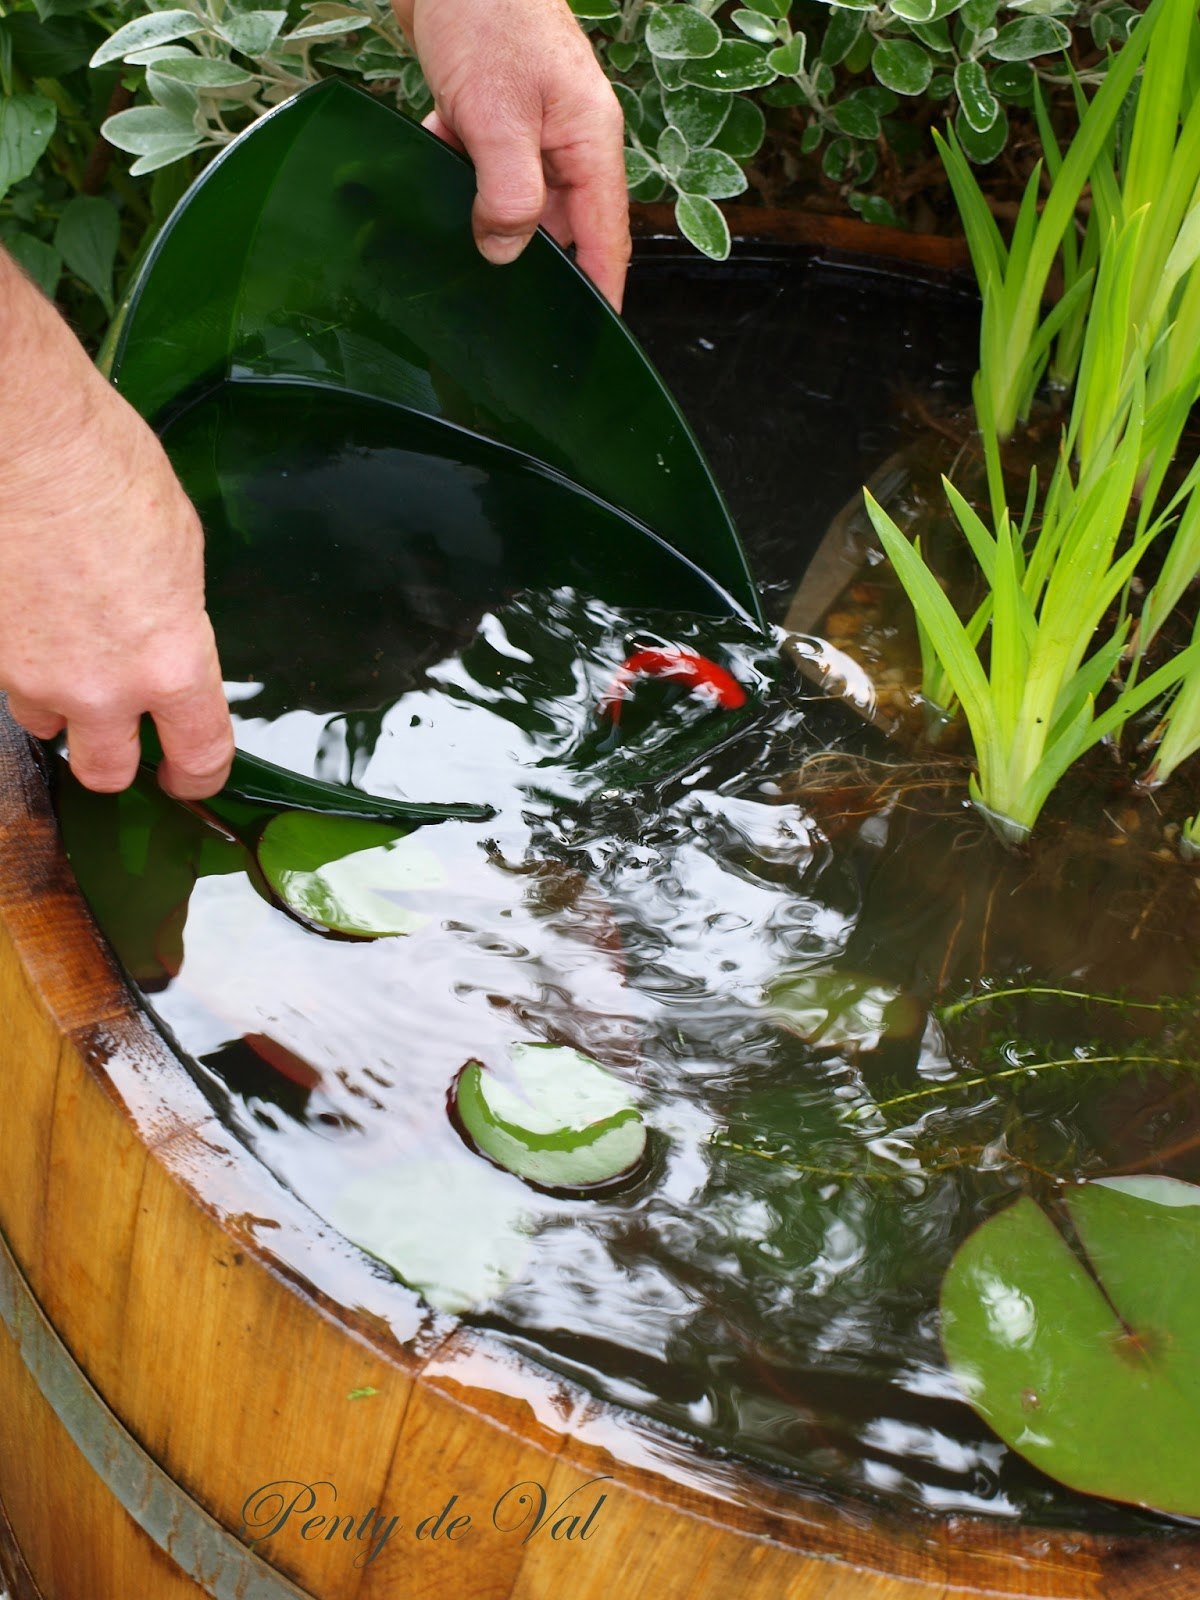 Penty De Val Un Mini Bassin Tonneau Dans Le Jardin